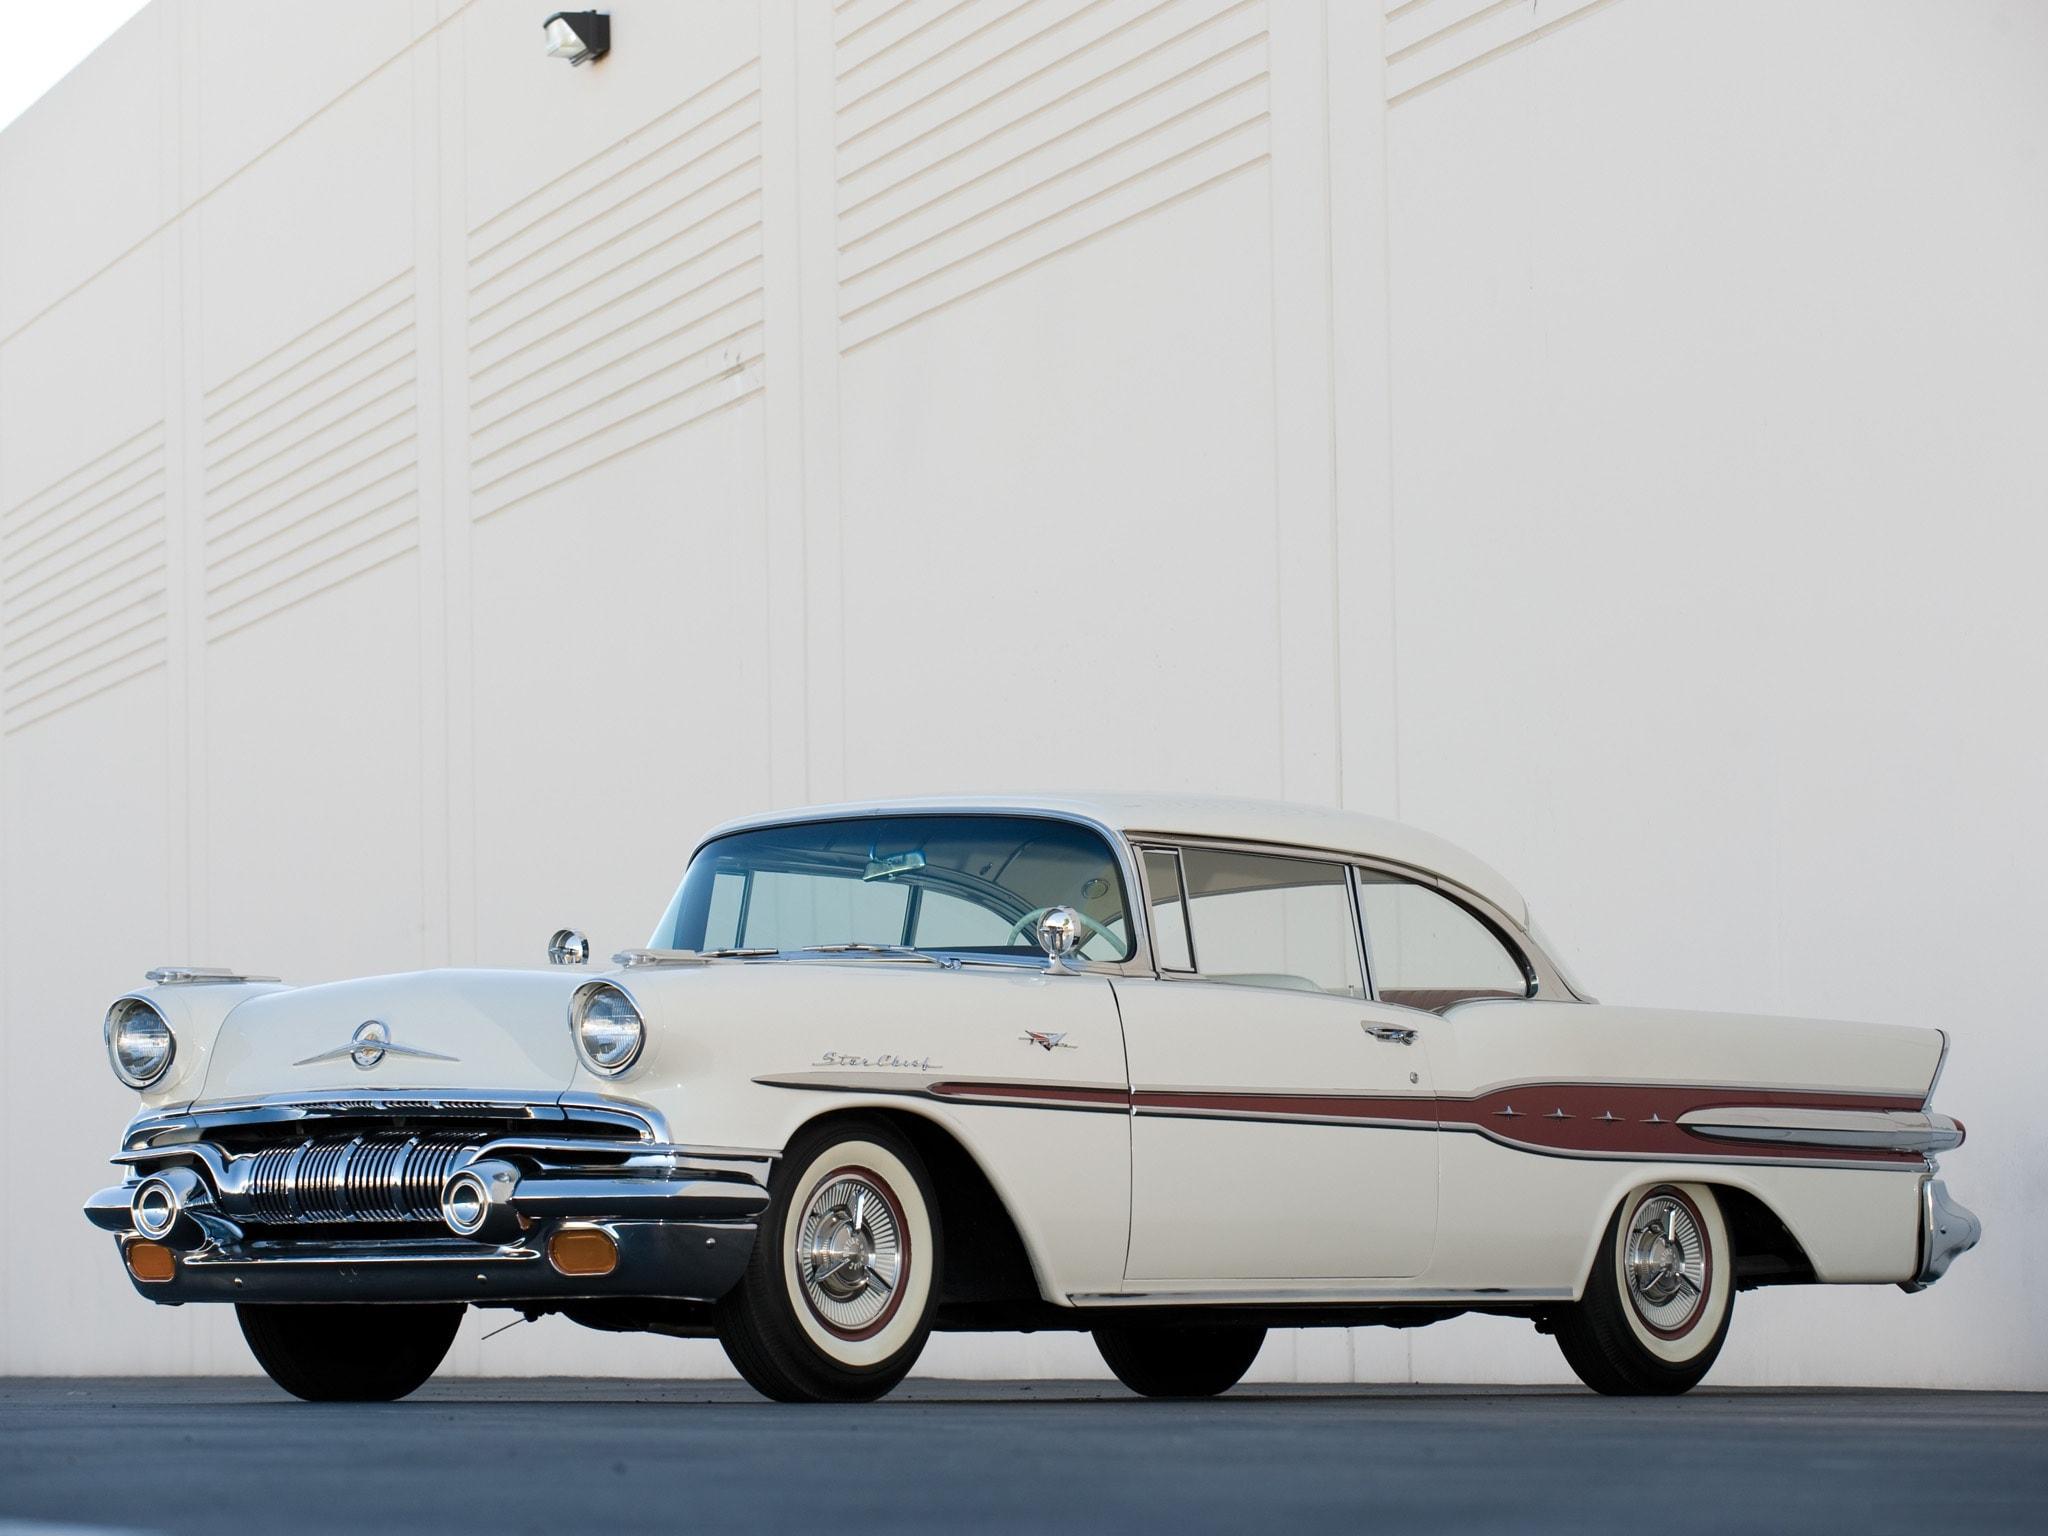 1957 Pontiac Star Chief Custom Bonneville Full hd wallpapers